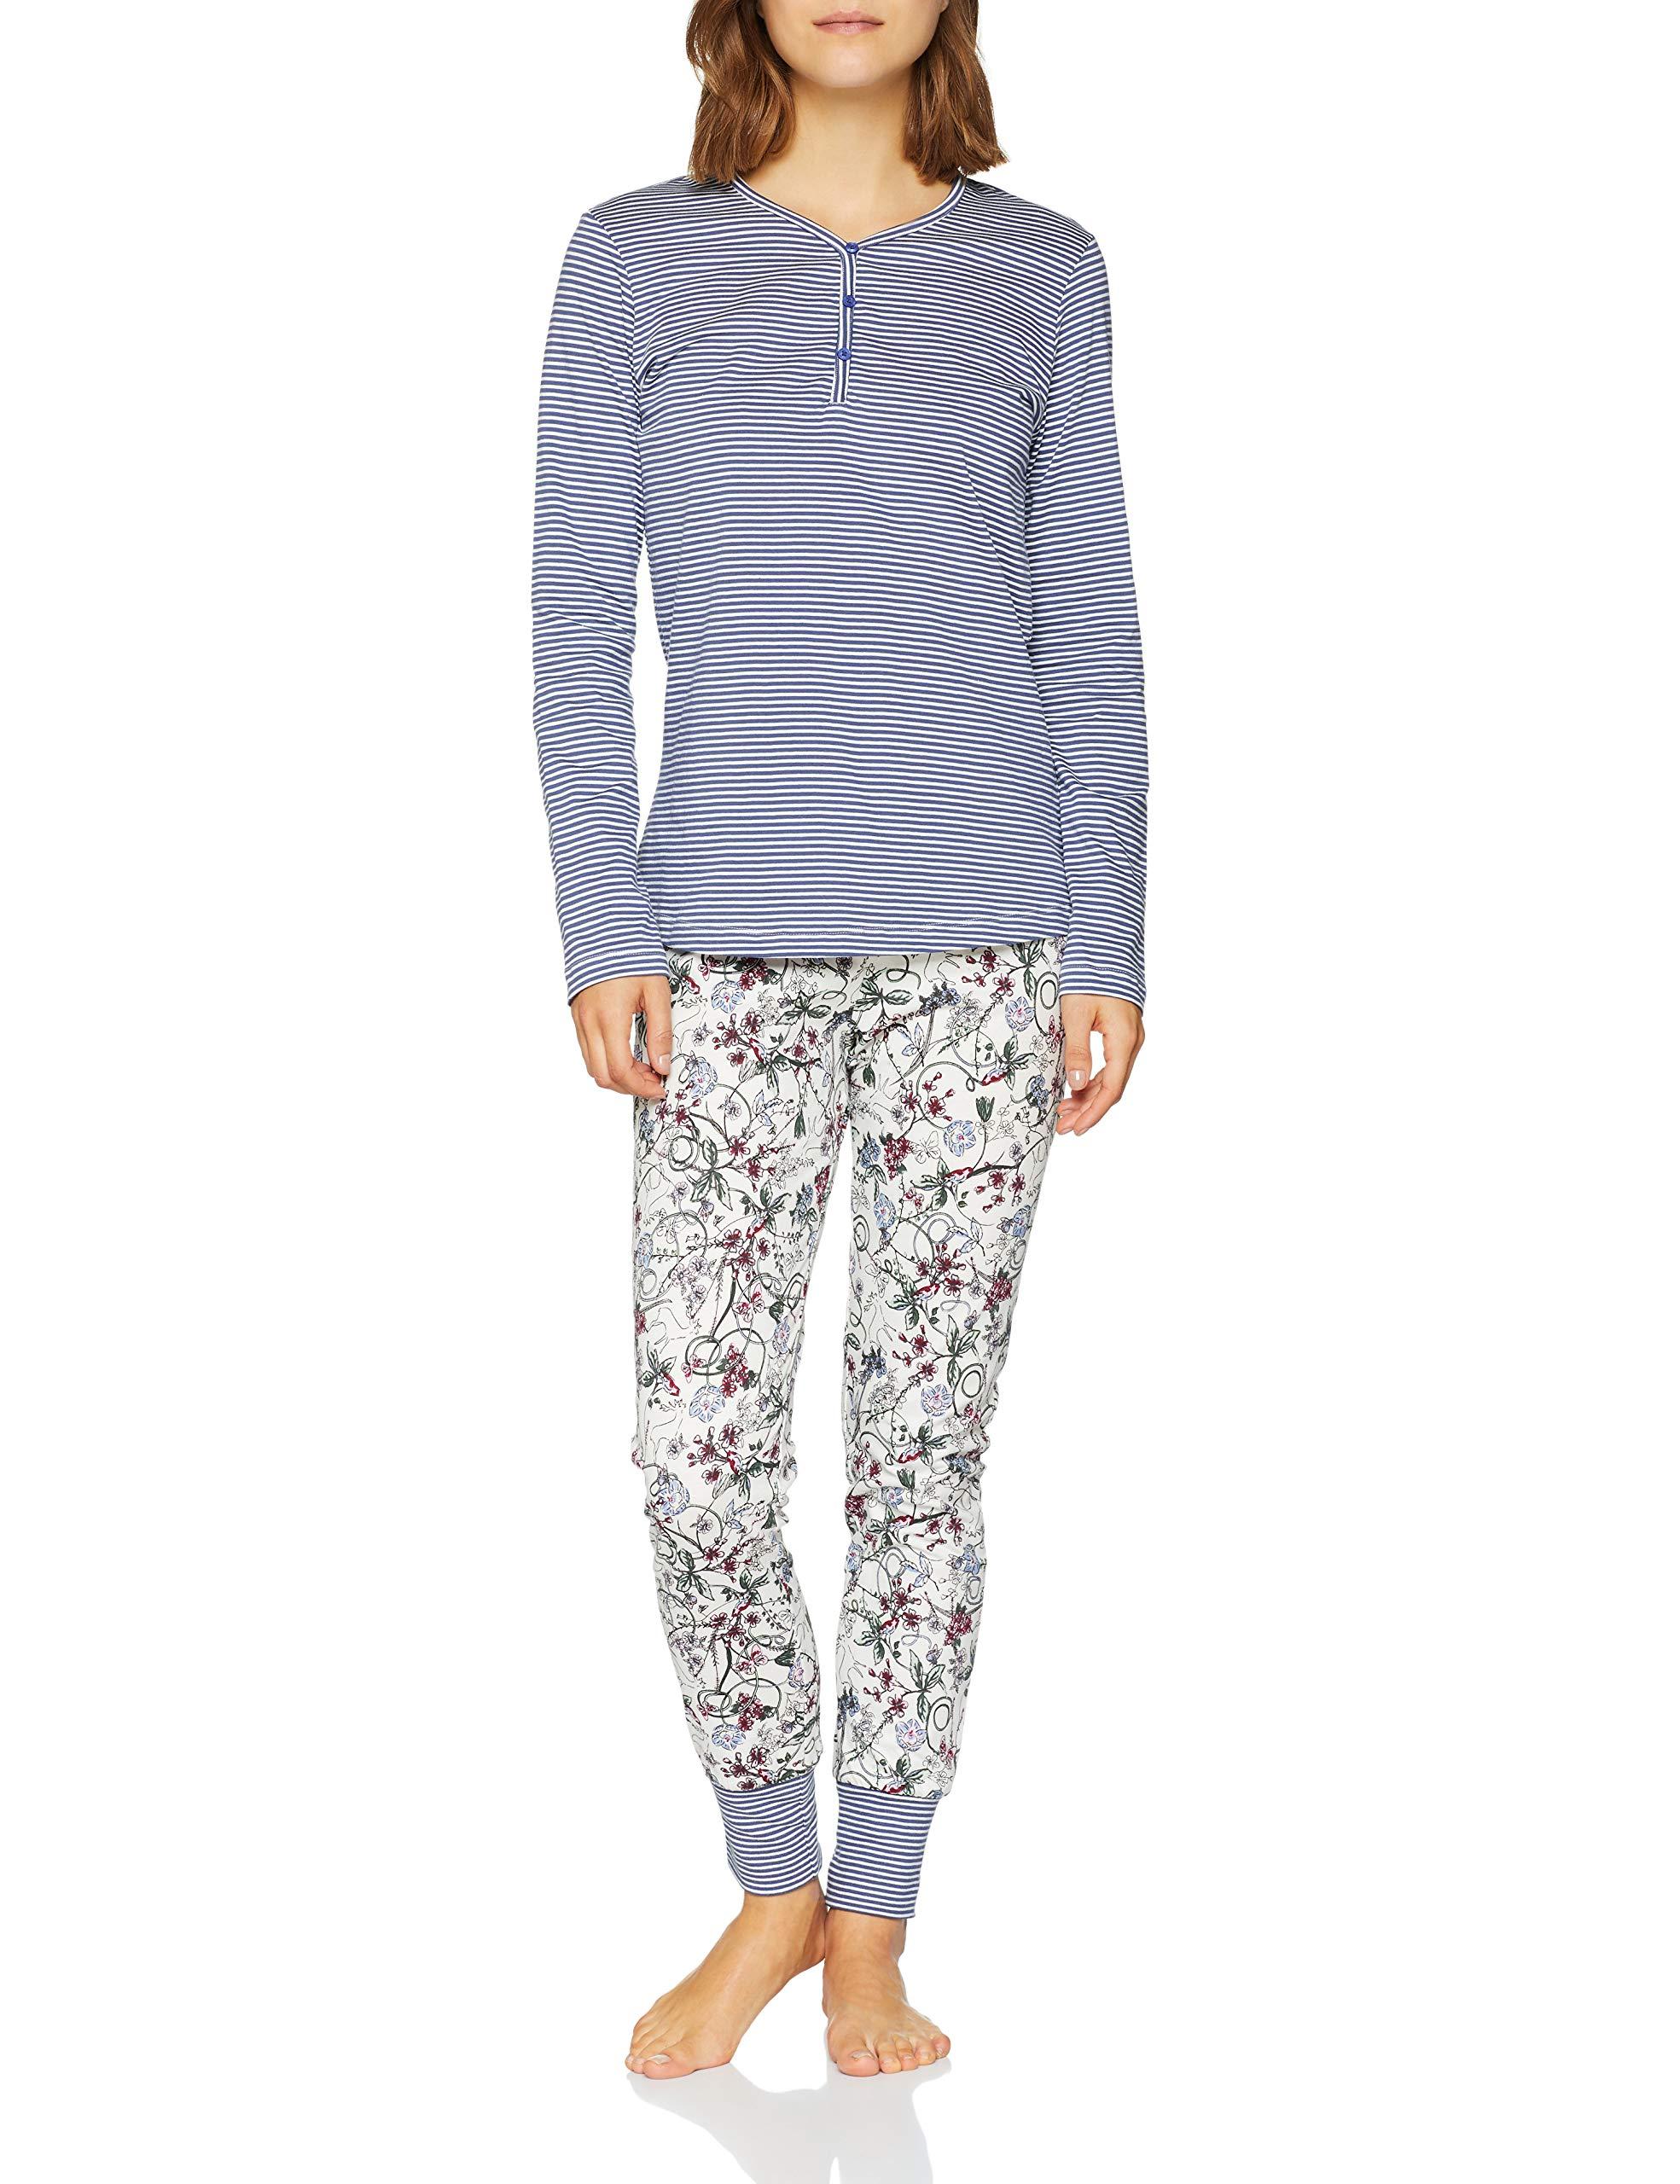 11040taille Esprit EnsembleBlancoff Fabricant38Femme White Nw Pyjama Cas 6vfgmY7yIb